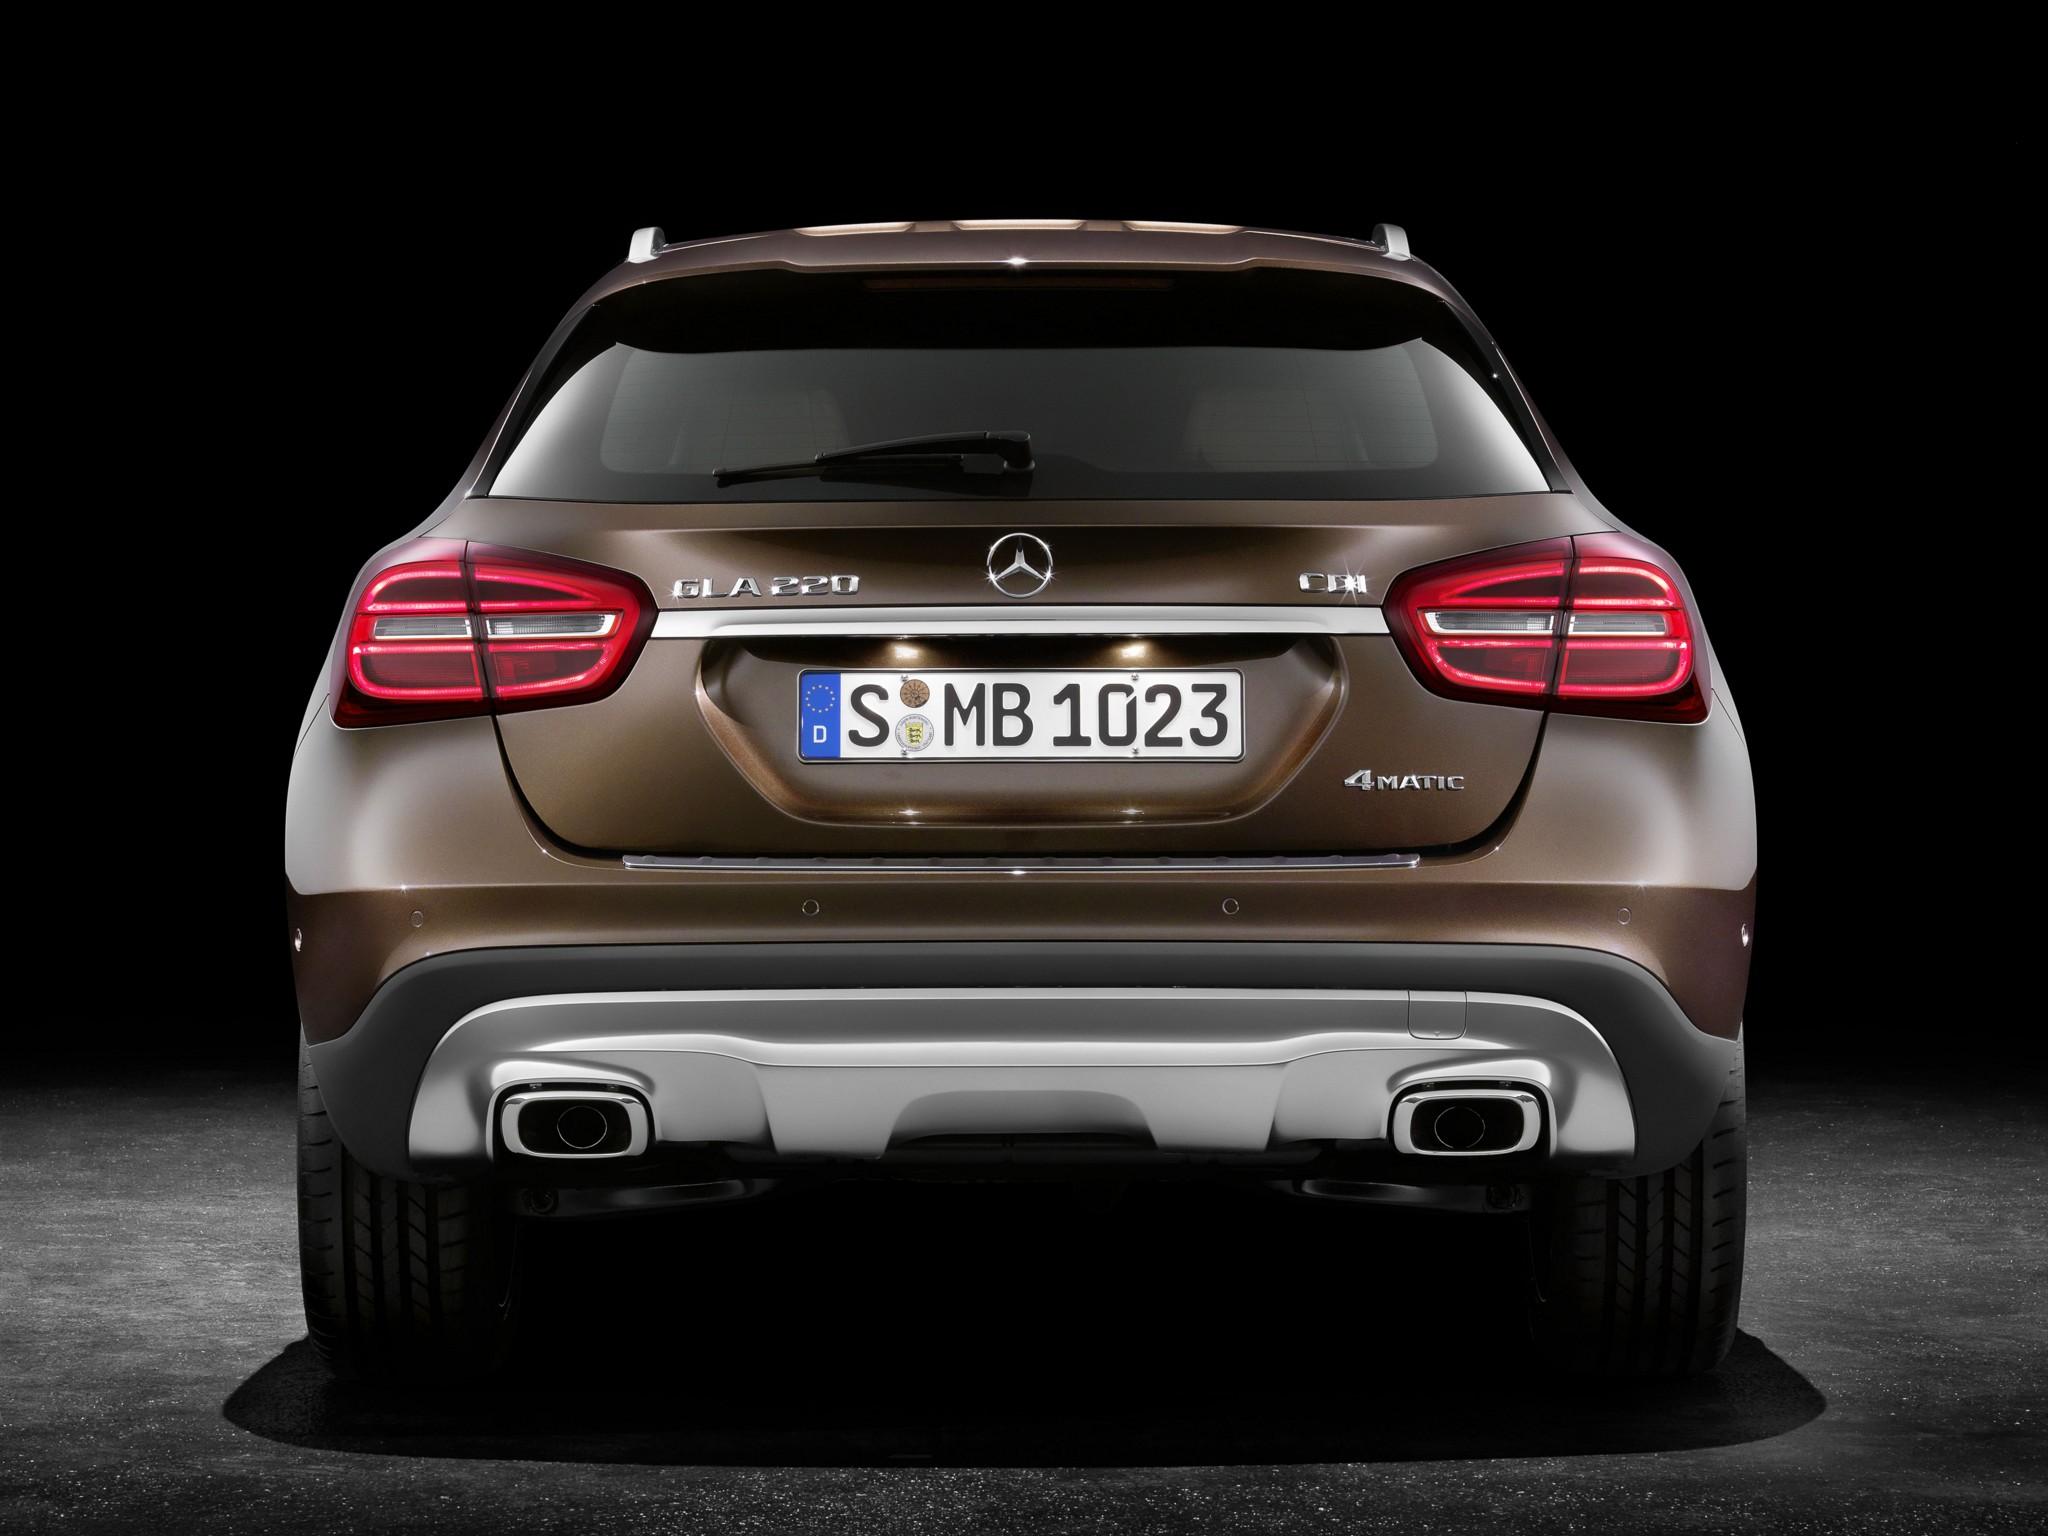 Mercedes GLA 220 CDI vs Volvo V40 Cross Country D4: the ...